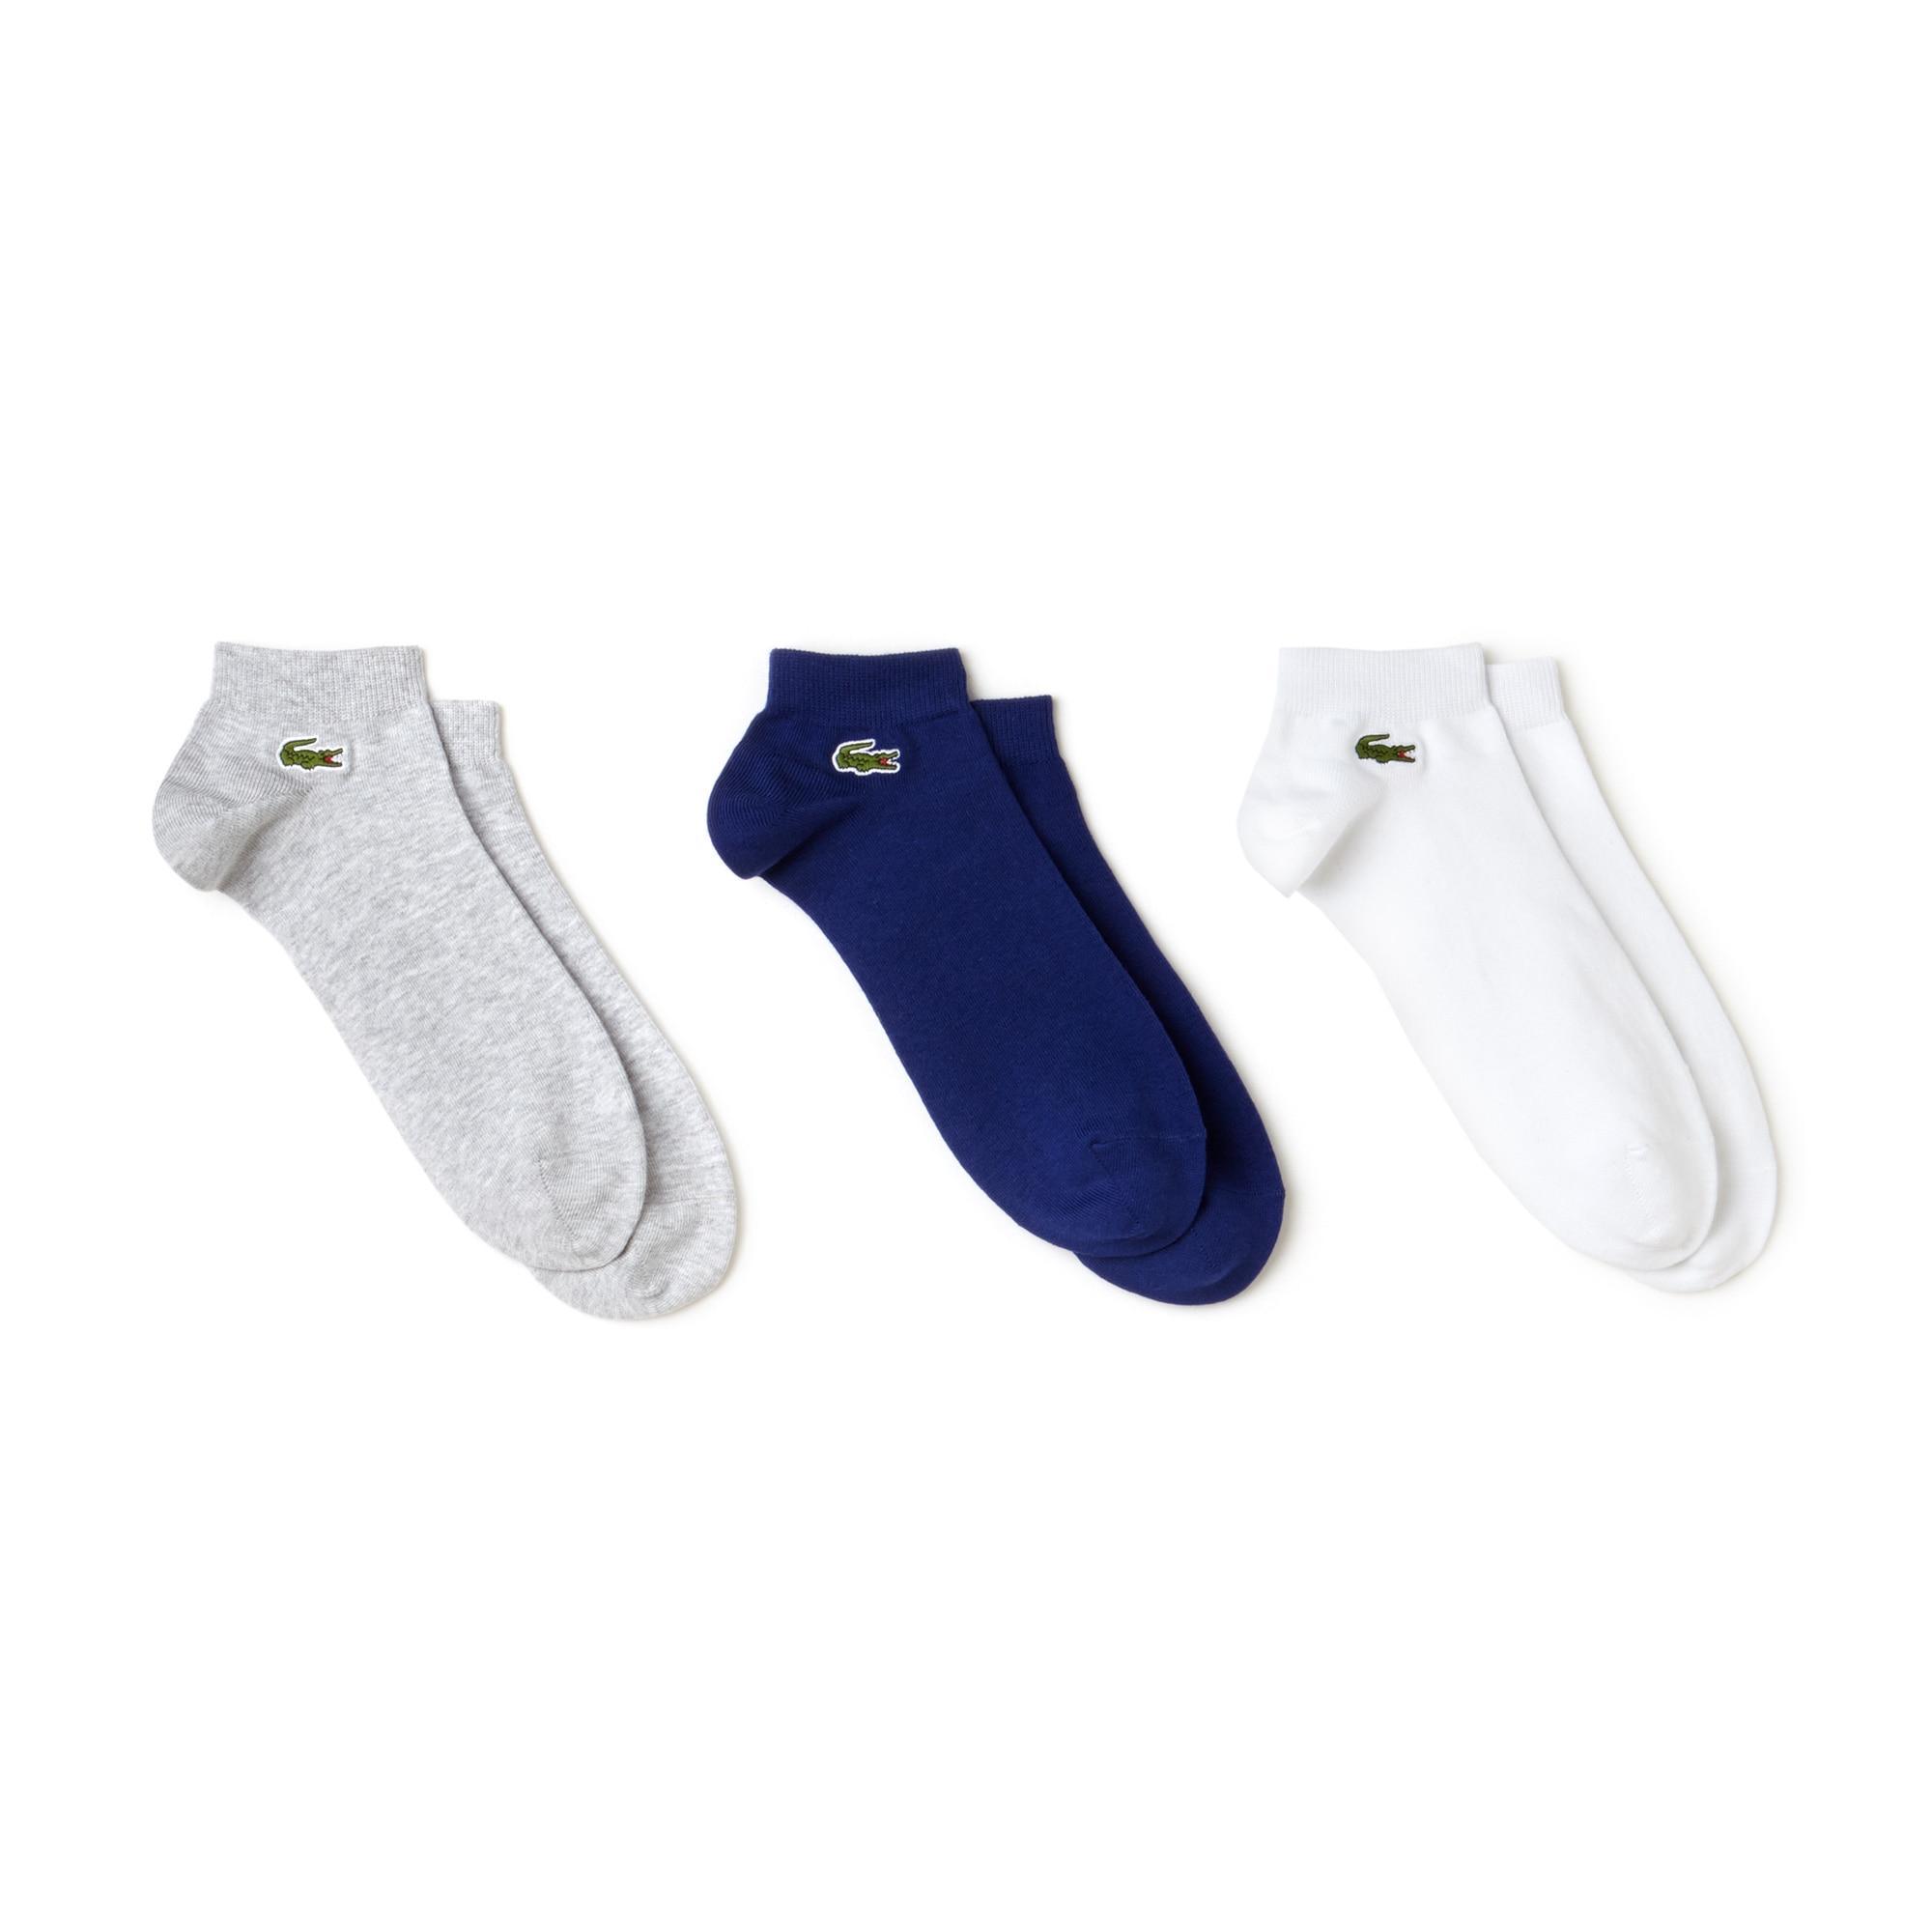 Men's Three-pack of Lacoste SPORT low-cut socks in solid jersey